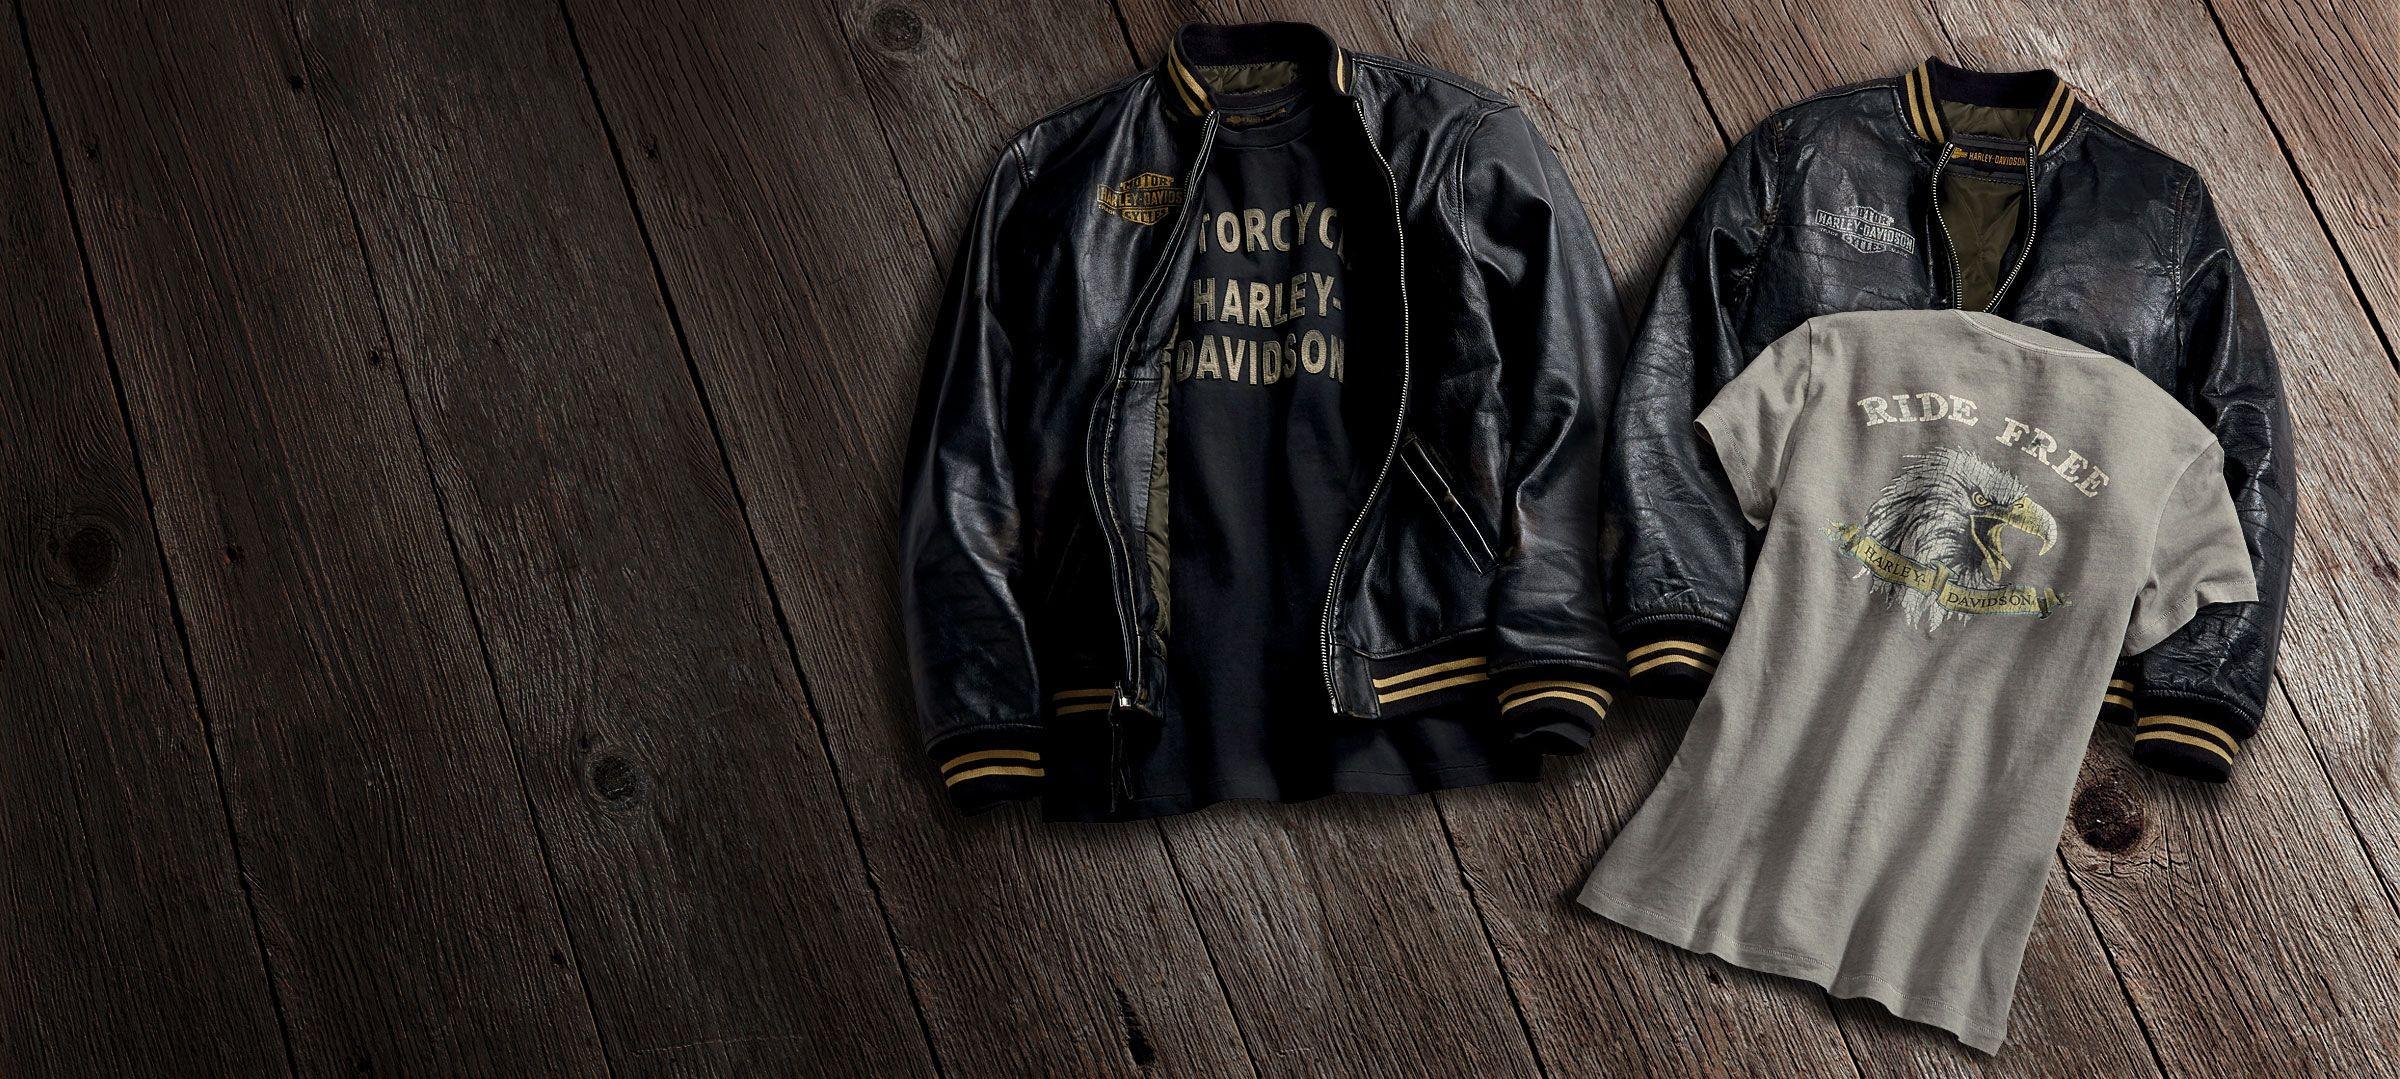 Barnett's Las Cruces Harley-Davidson®